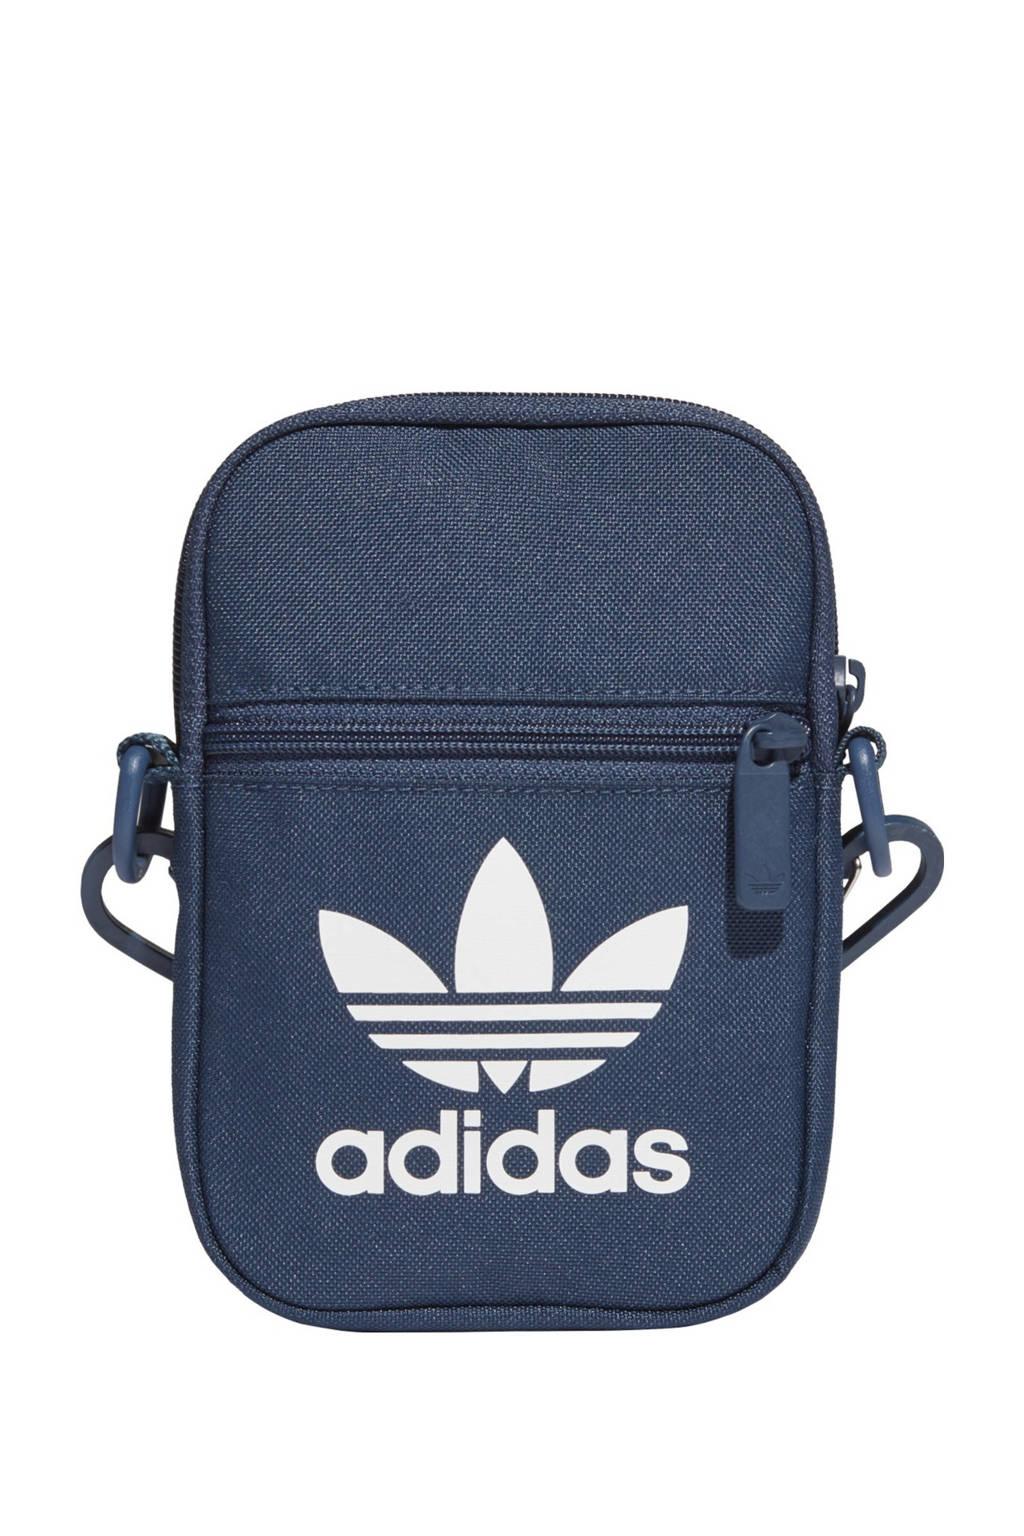 adidas Originals  Adicolor crossbody tas donkerblauw, Donkerblauw